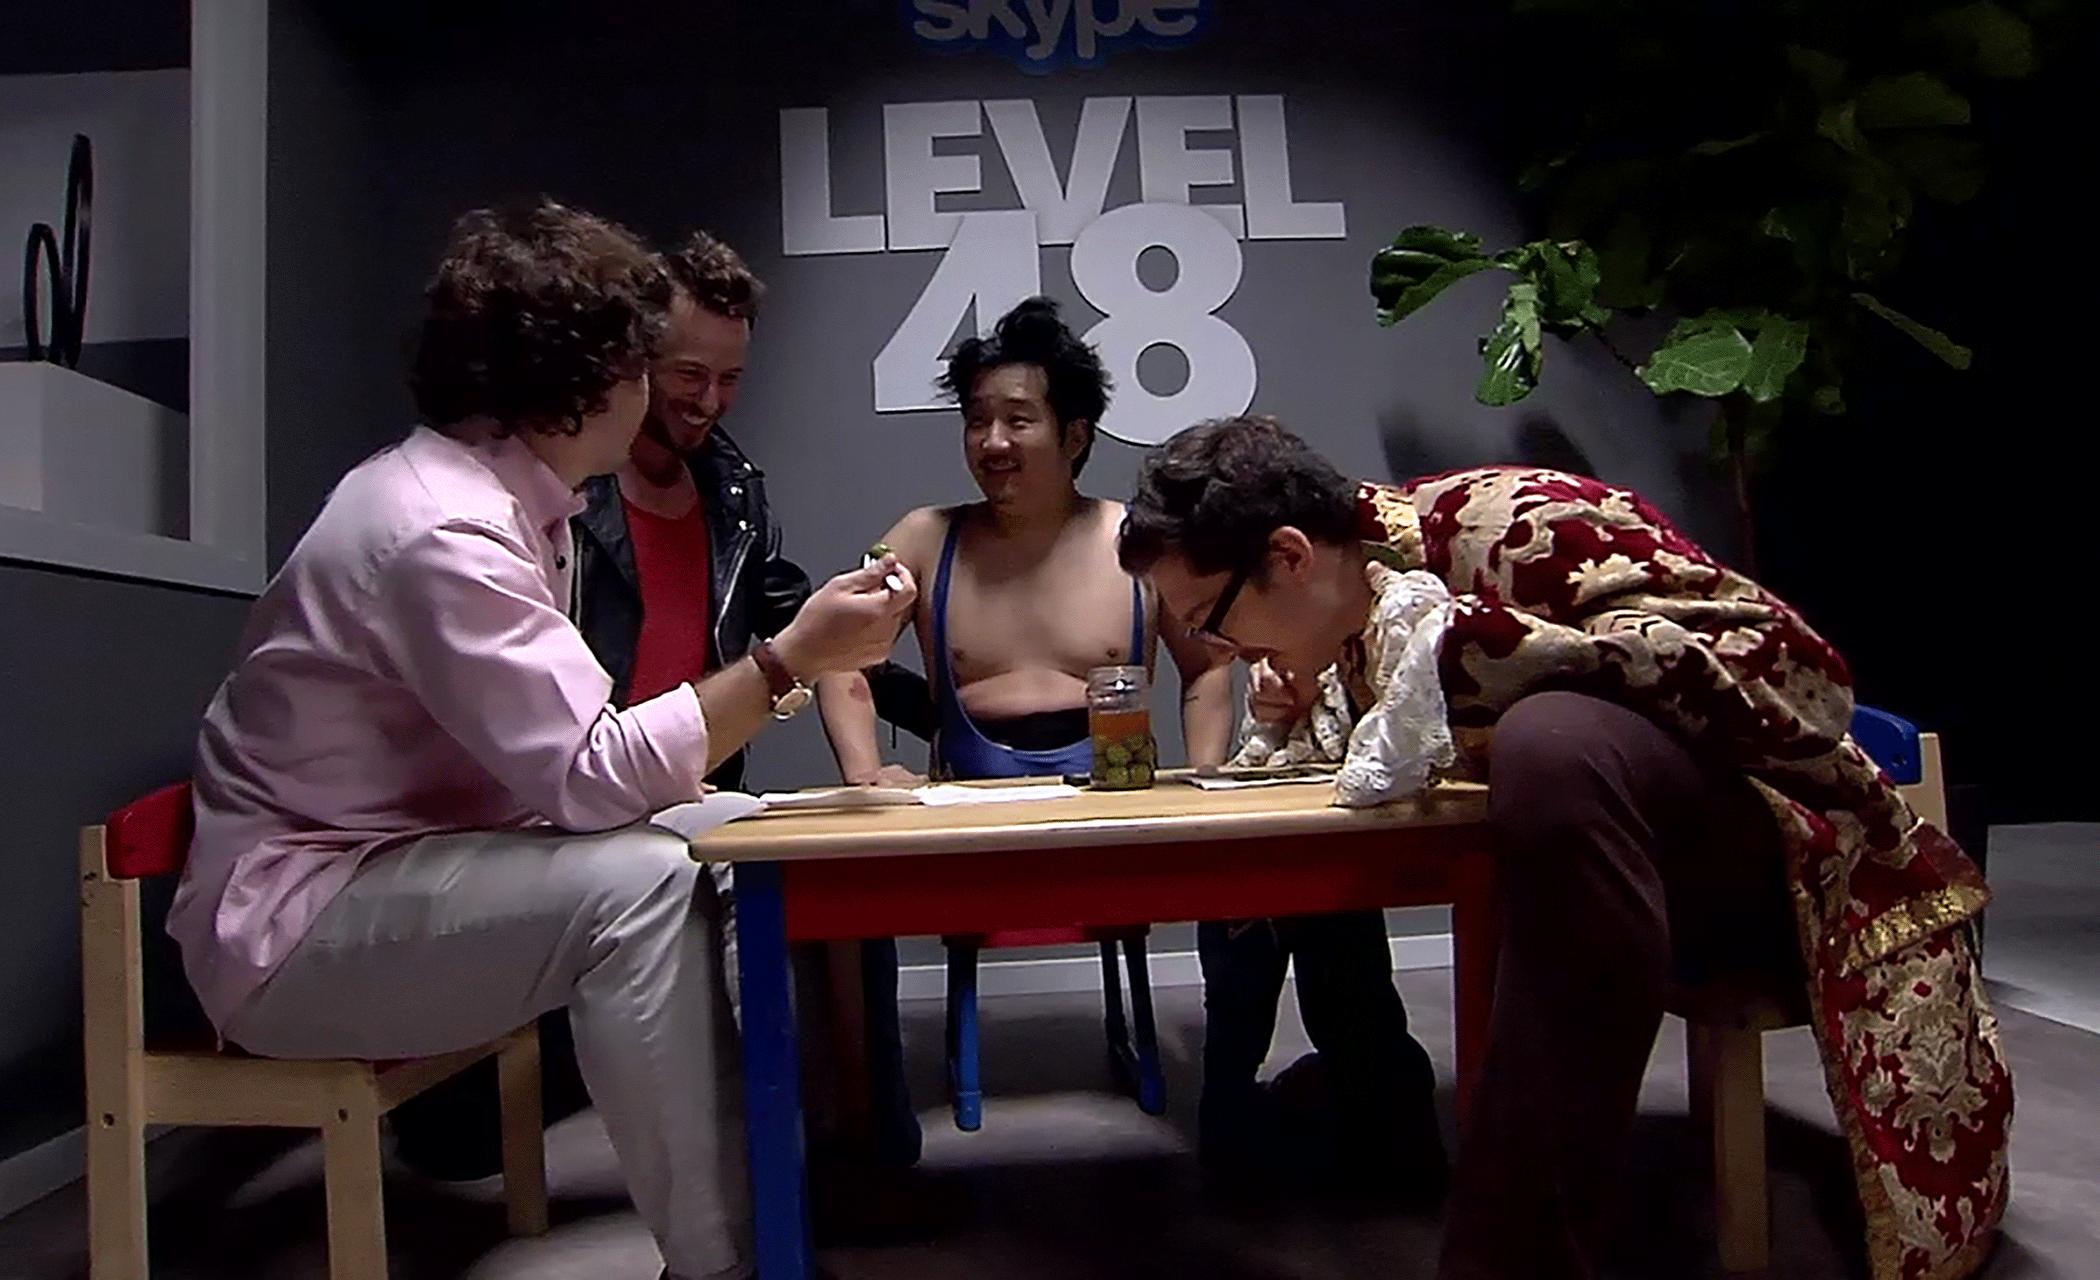 Skype – Level 48